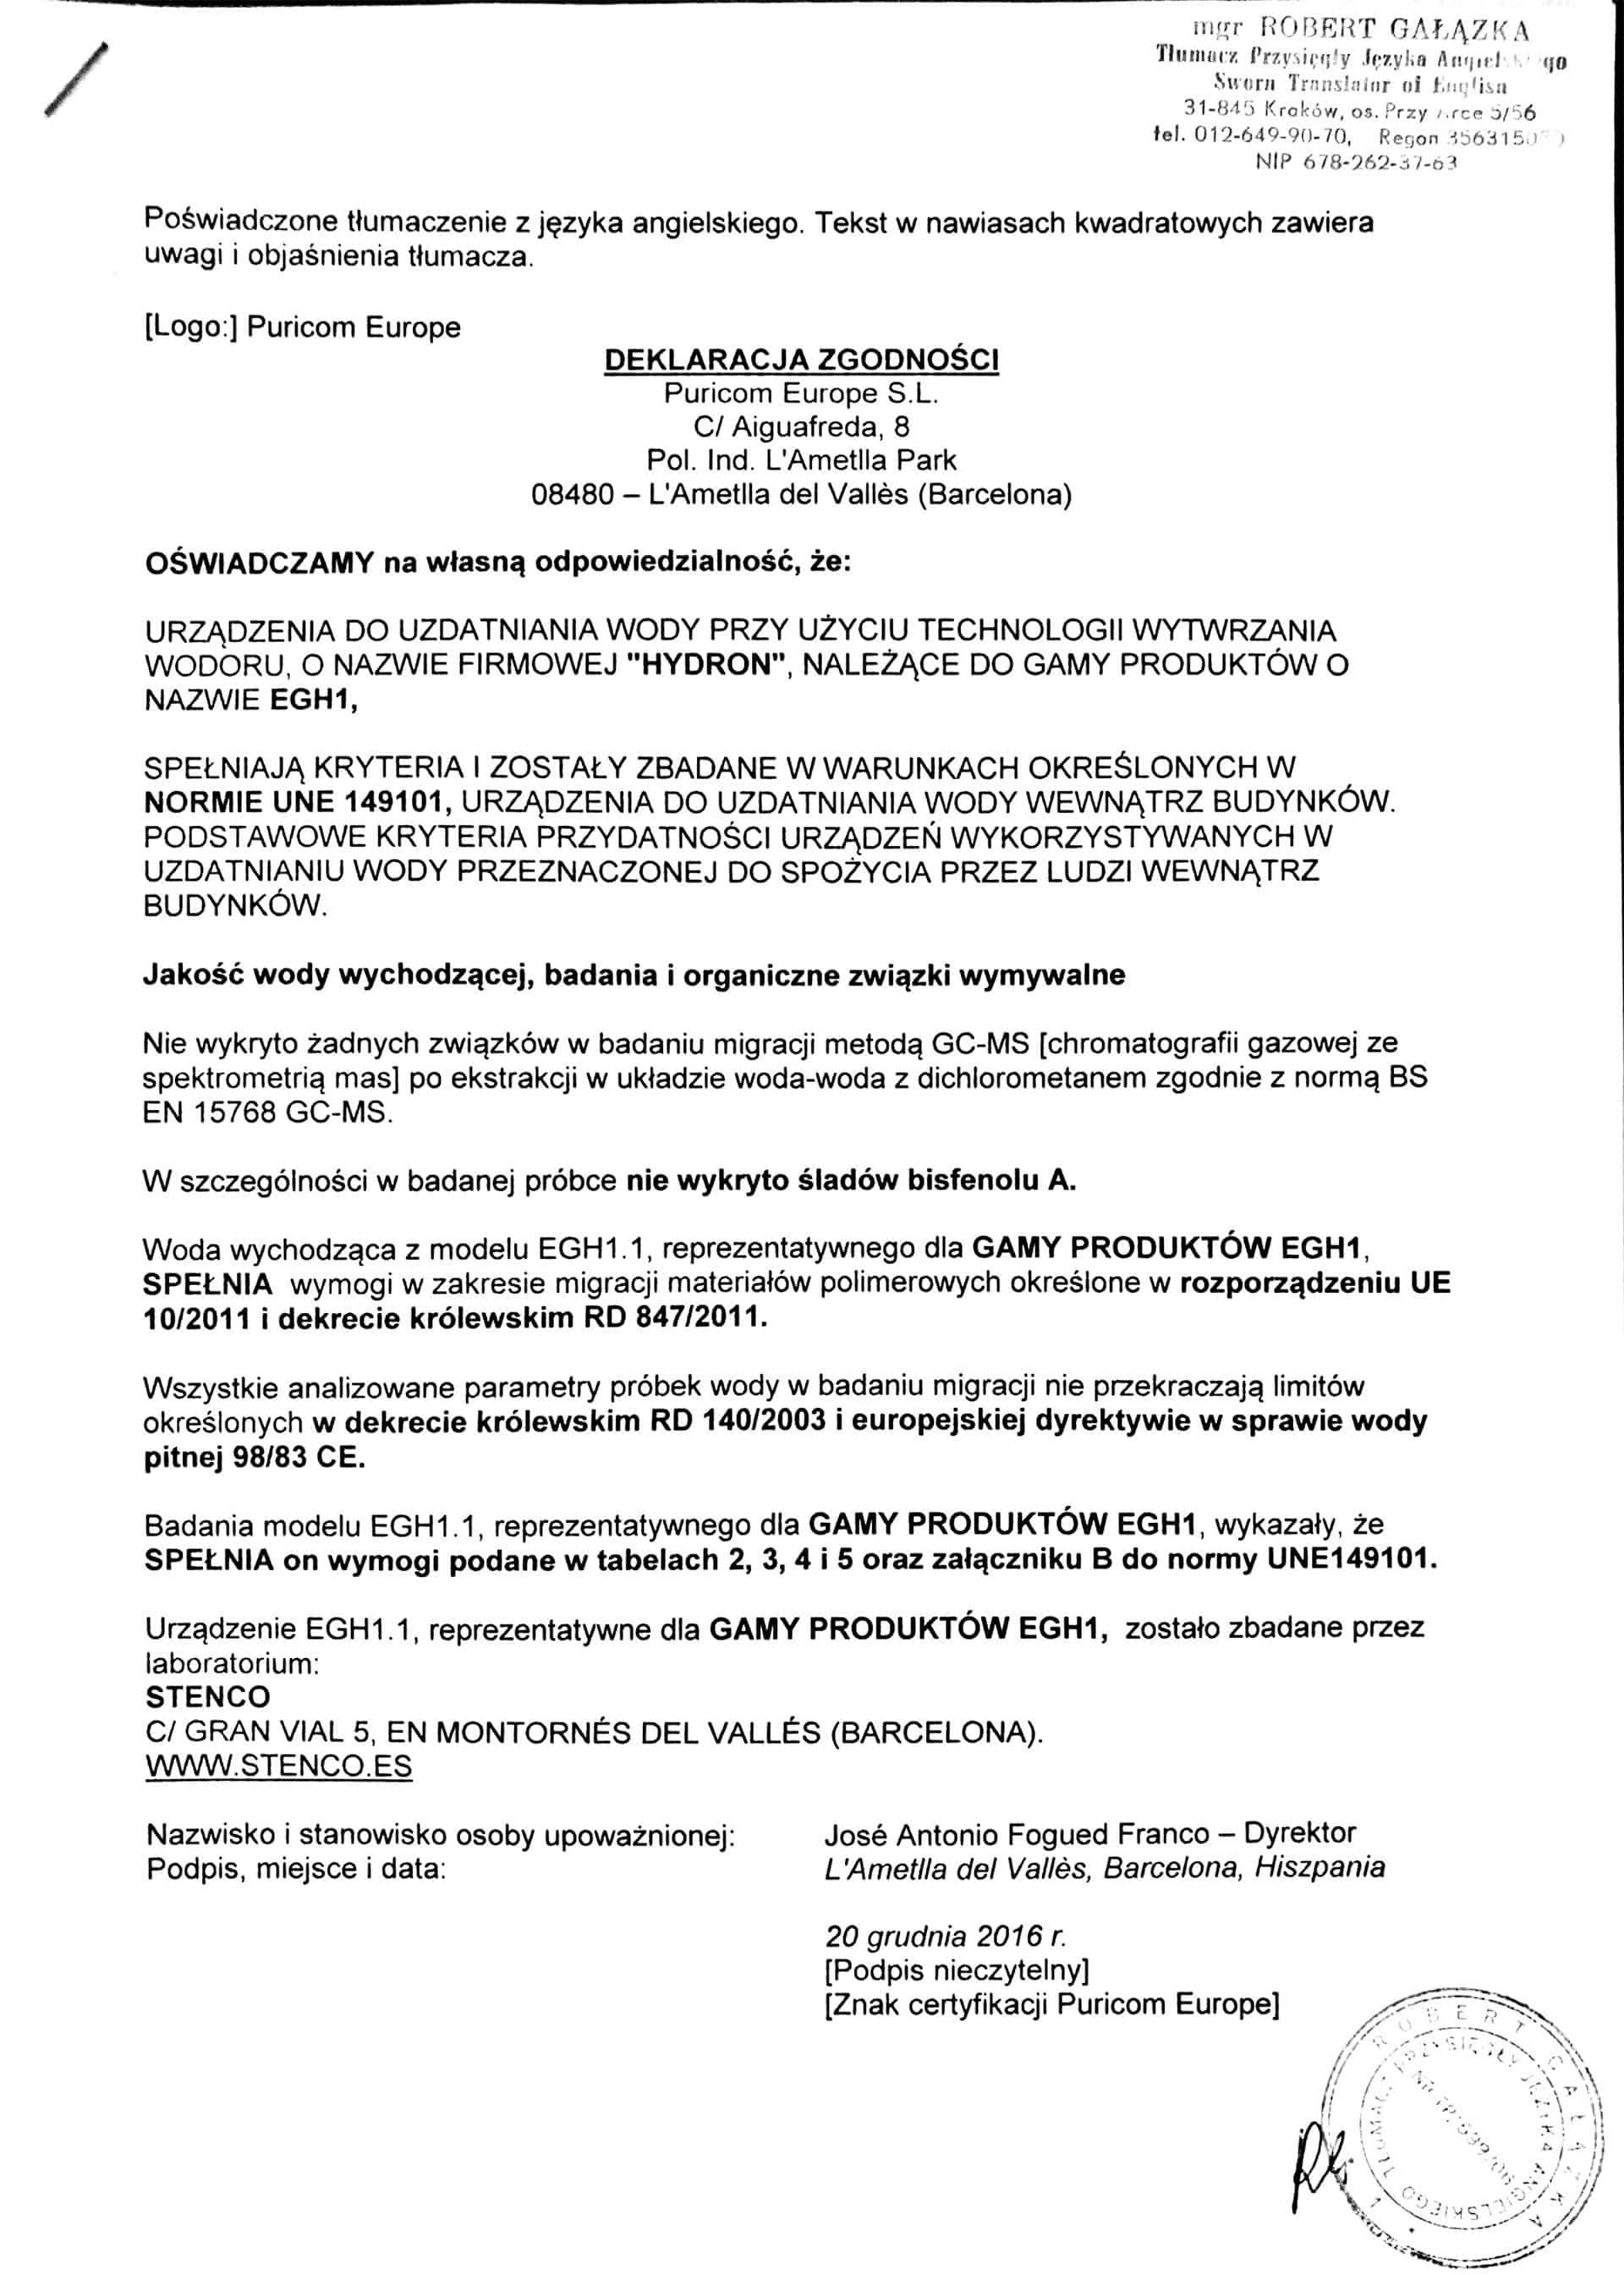 Certyfikat hydron 3